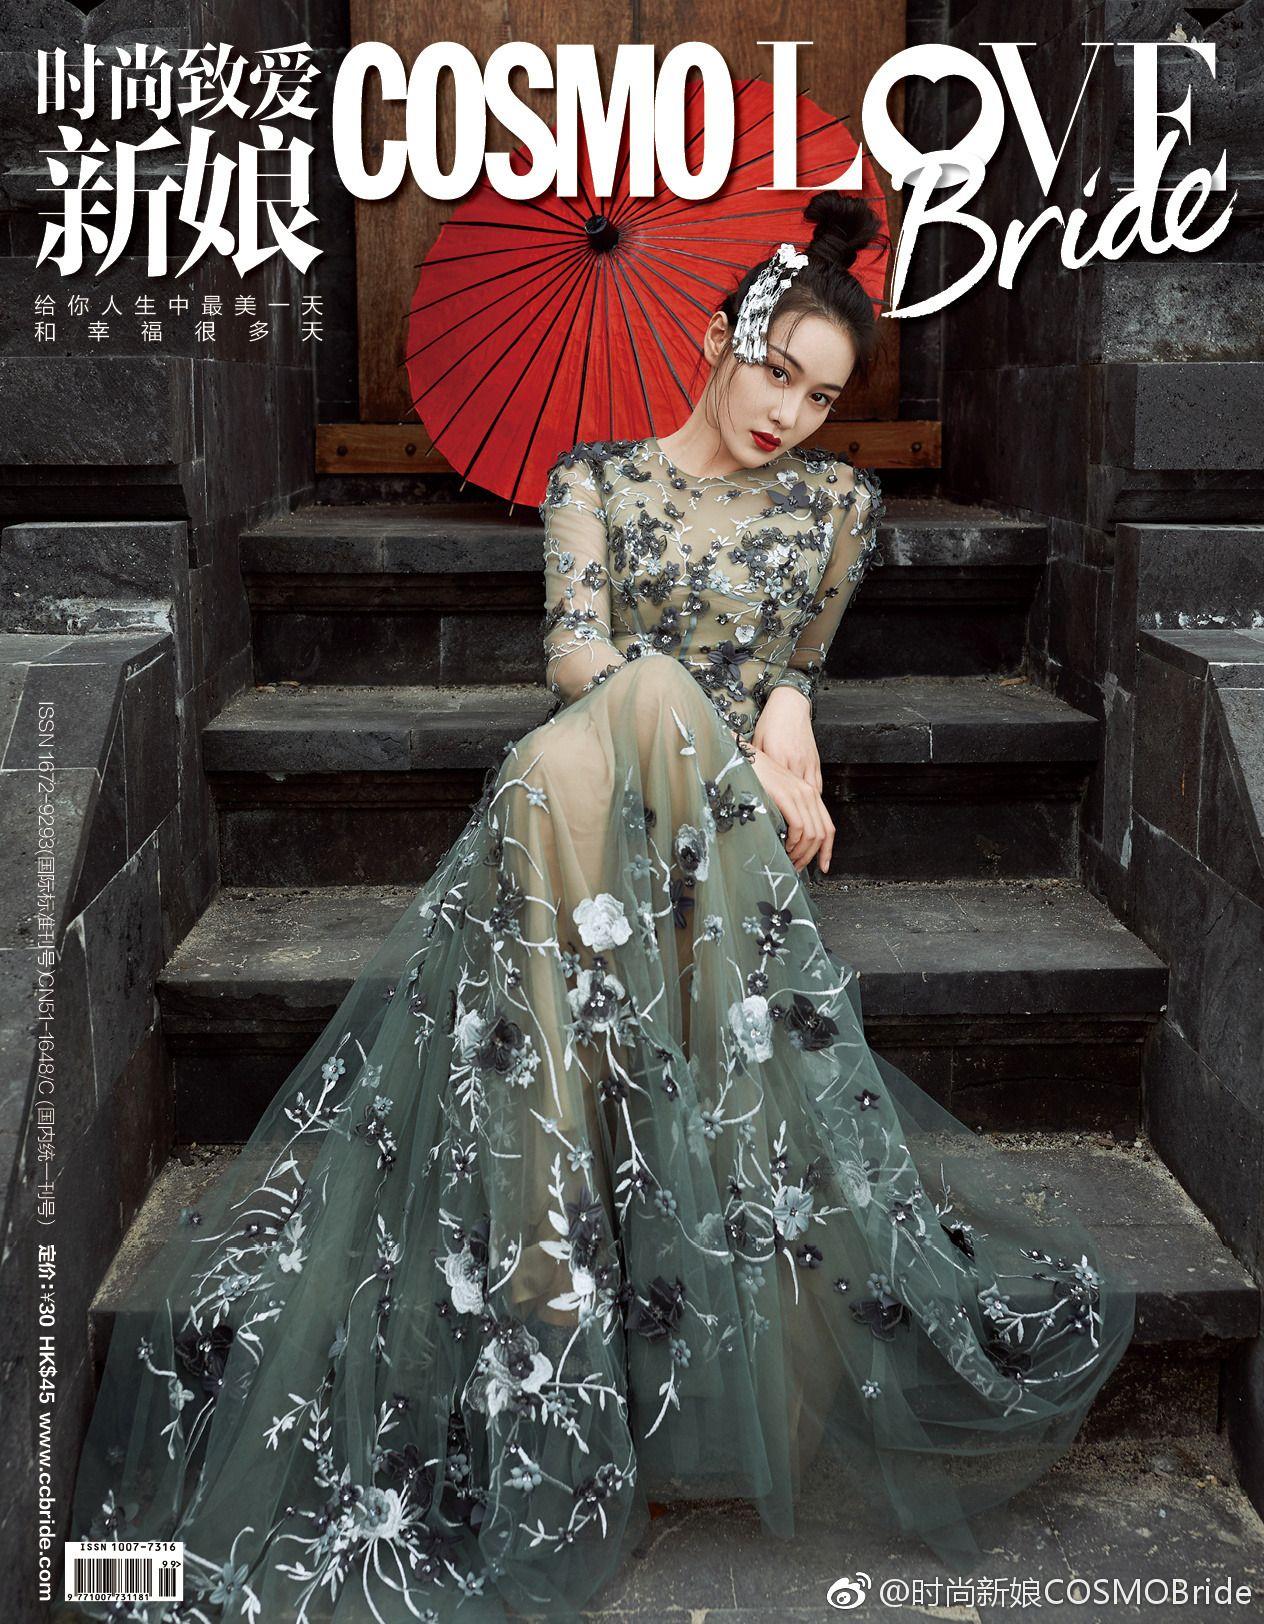 Cosmo bride zhāng xīn yǔ 张馨予 all asian all ways pinterest